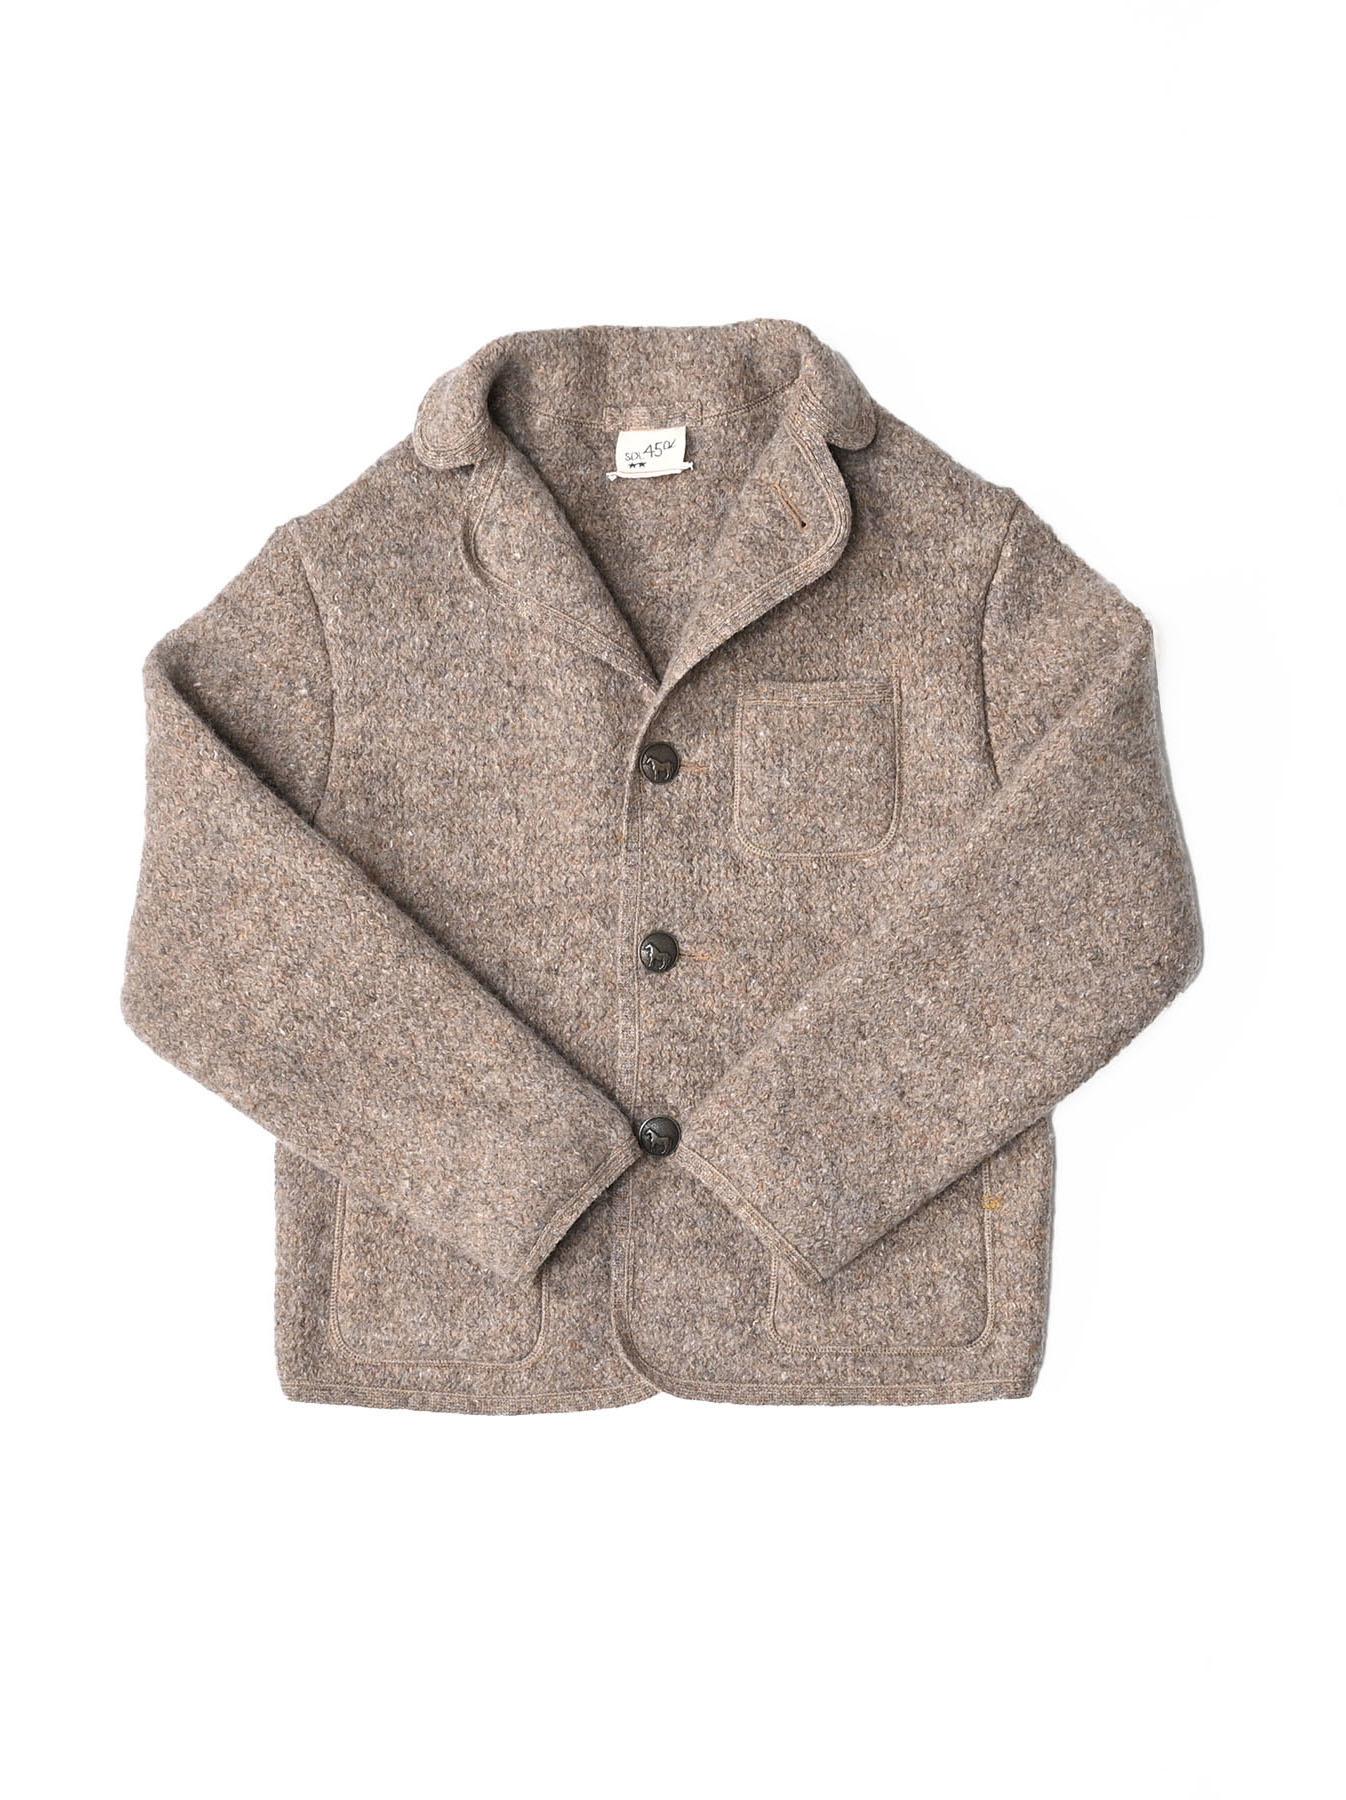 Cotton Shetland 908 Tyrolean Jacket-3